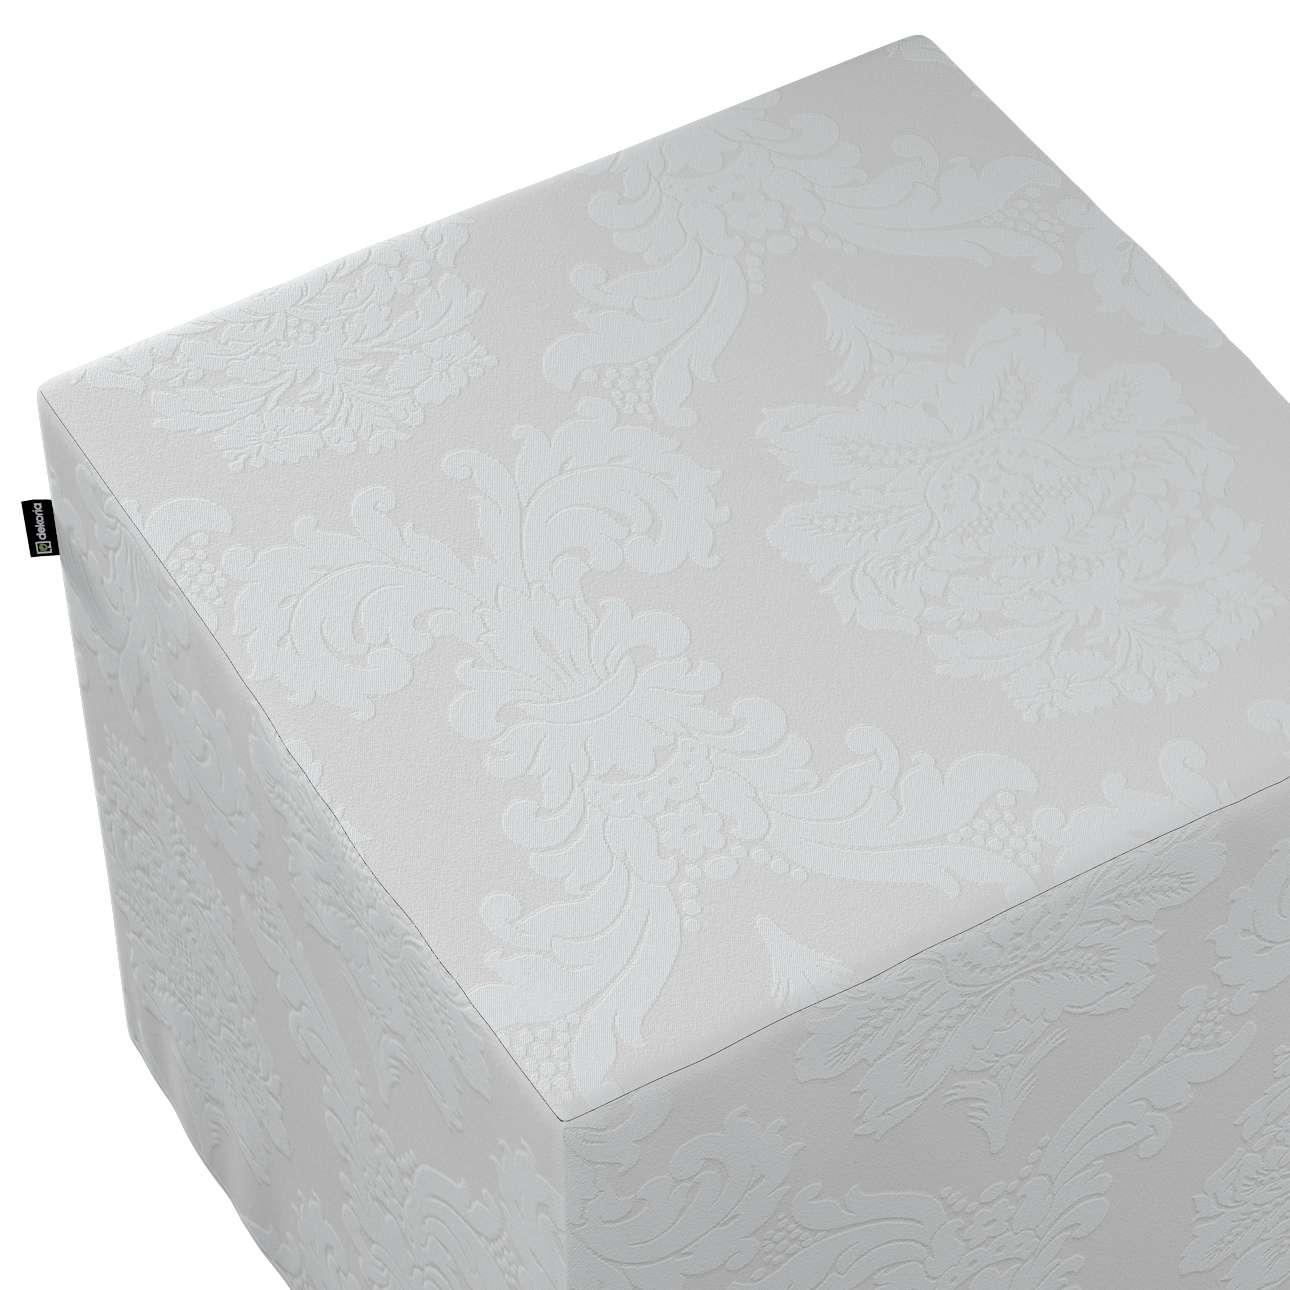 Sedák Cube - kostka pevná 40x40x40 v kolekci Damasco, látka: 613-81